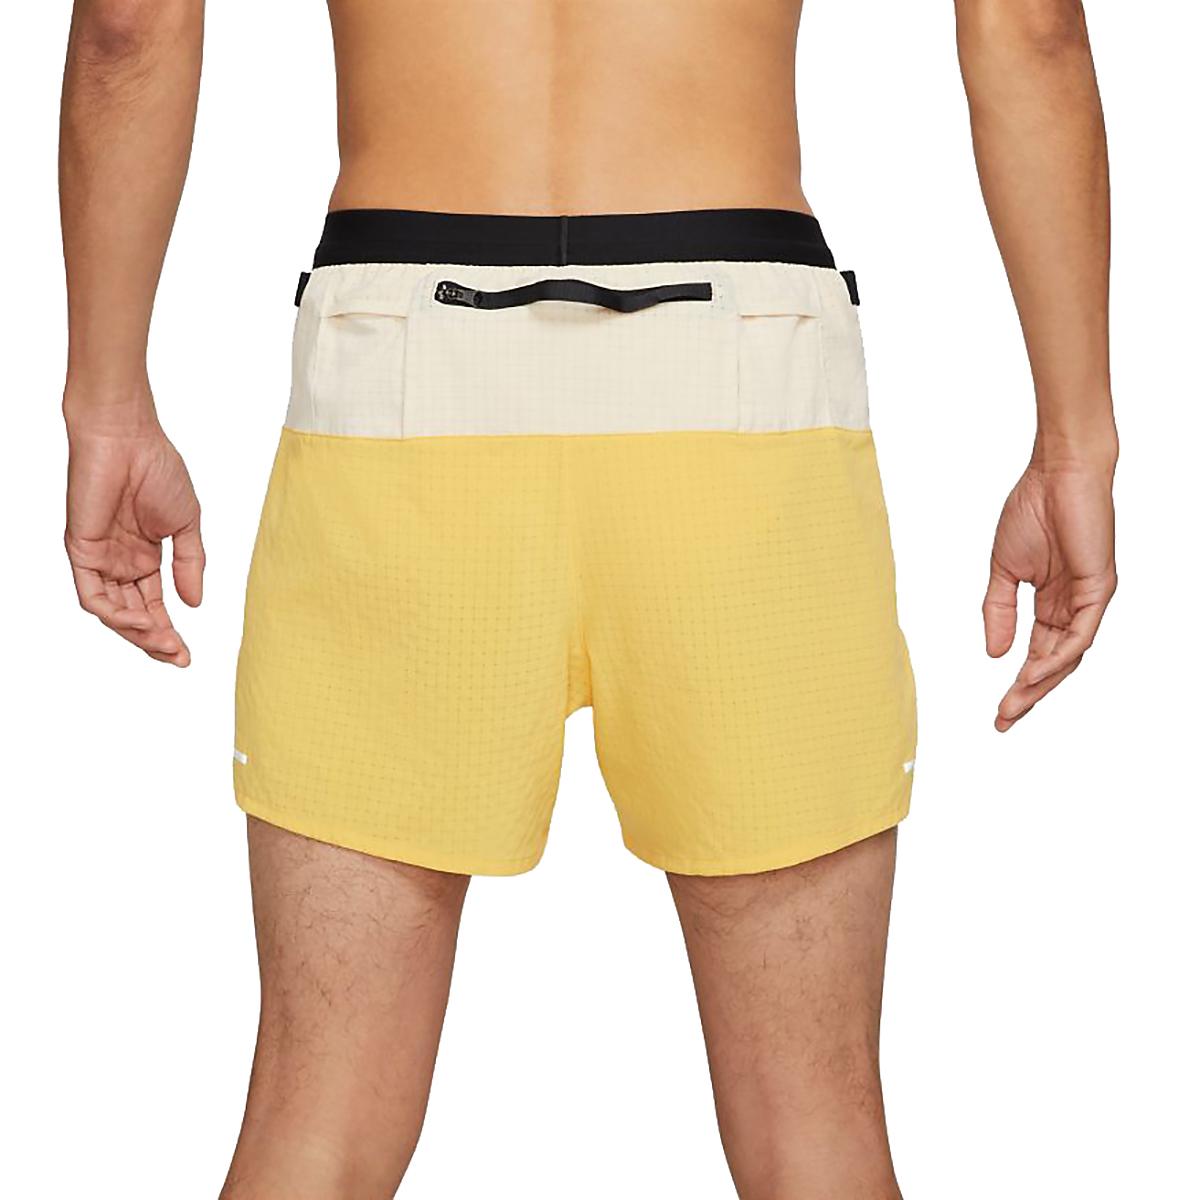 Men's Nike Dri-FIT Flex Stride Trail Shorts - Color: Solar Flare/Beach/Black - Size: S, Solar Flare/Beach/Black, large, image 2